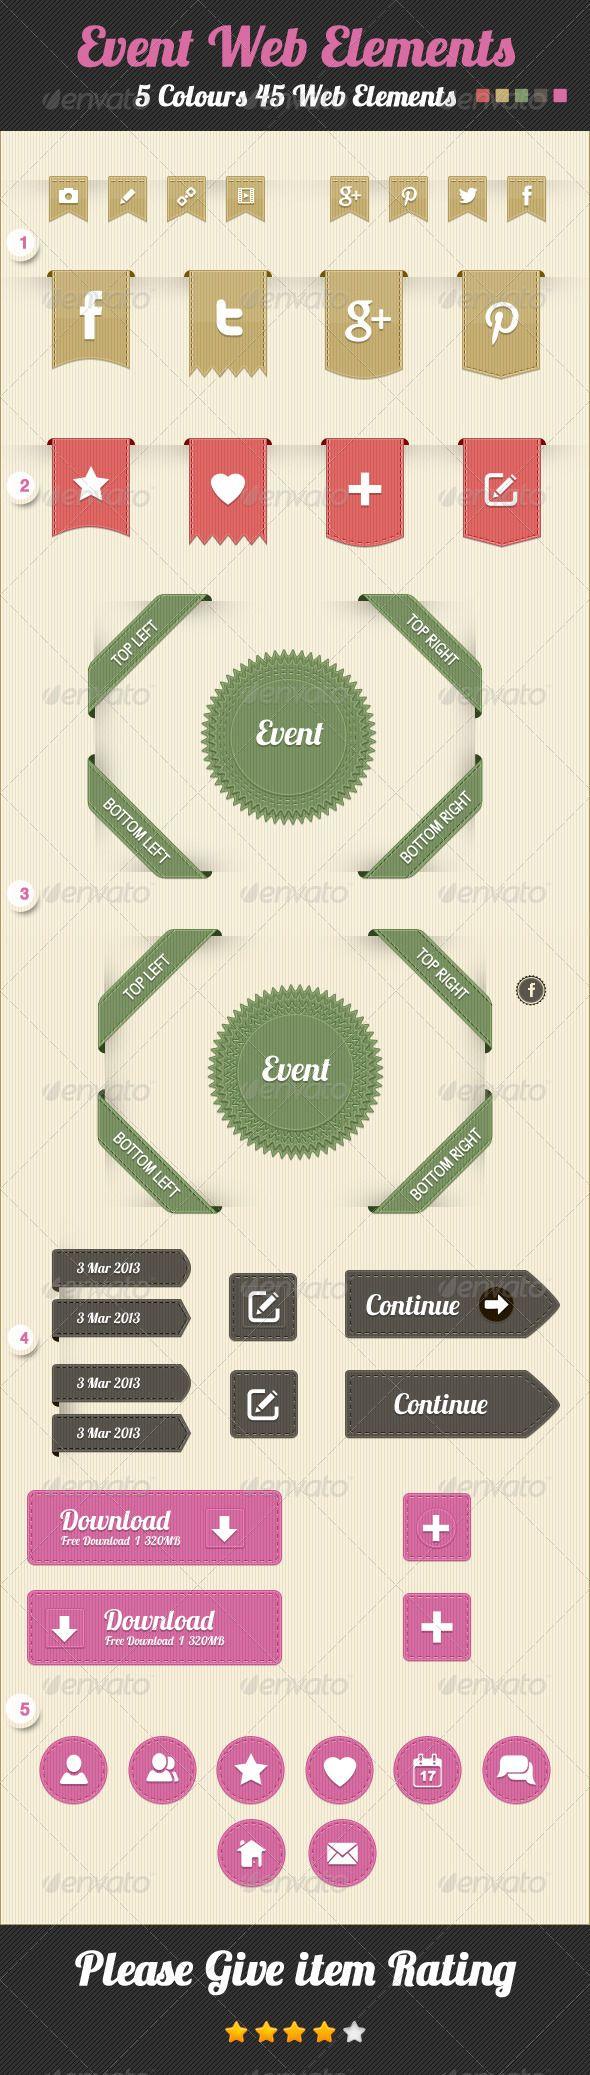 Event Web Elements